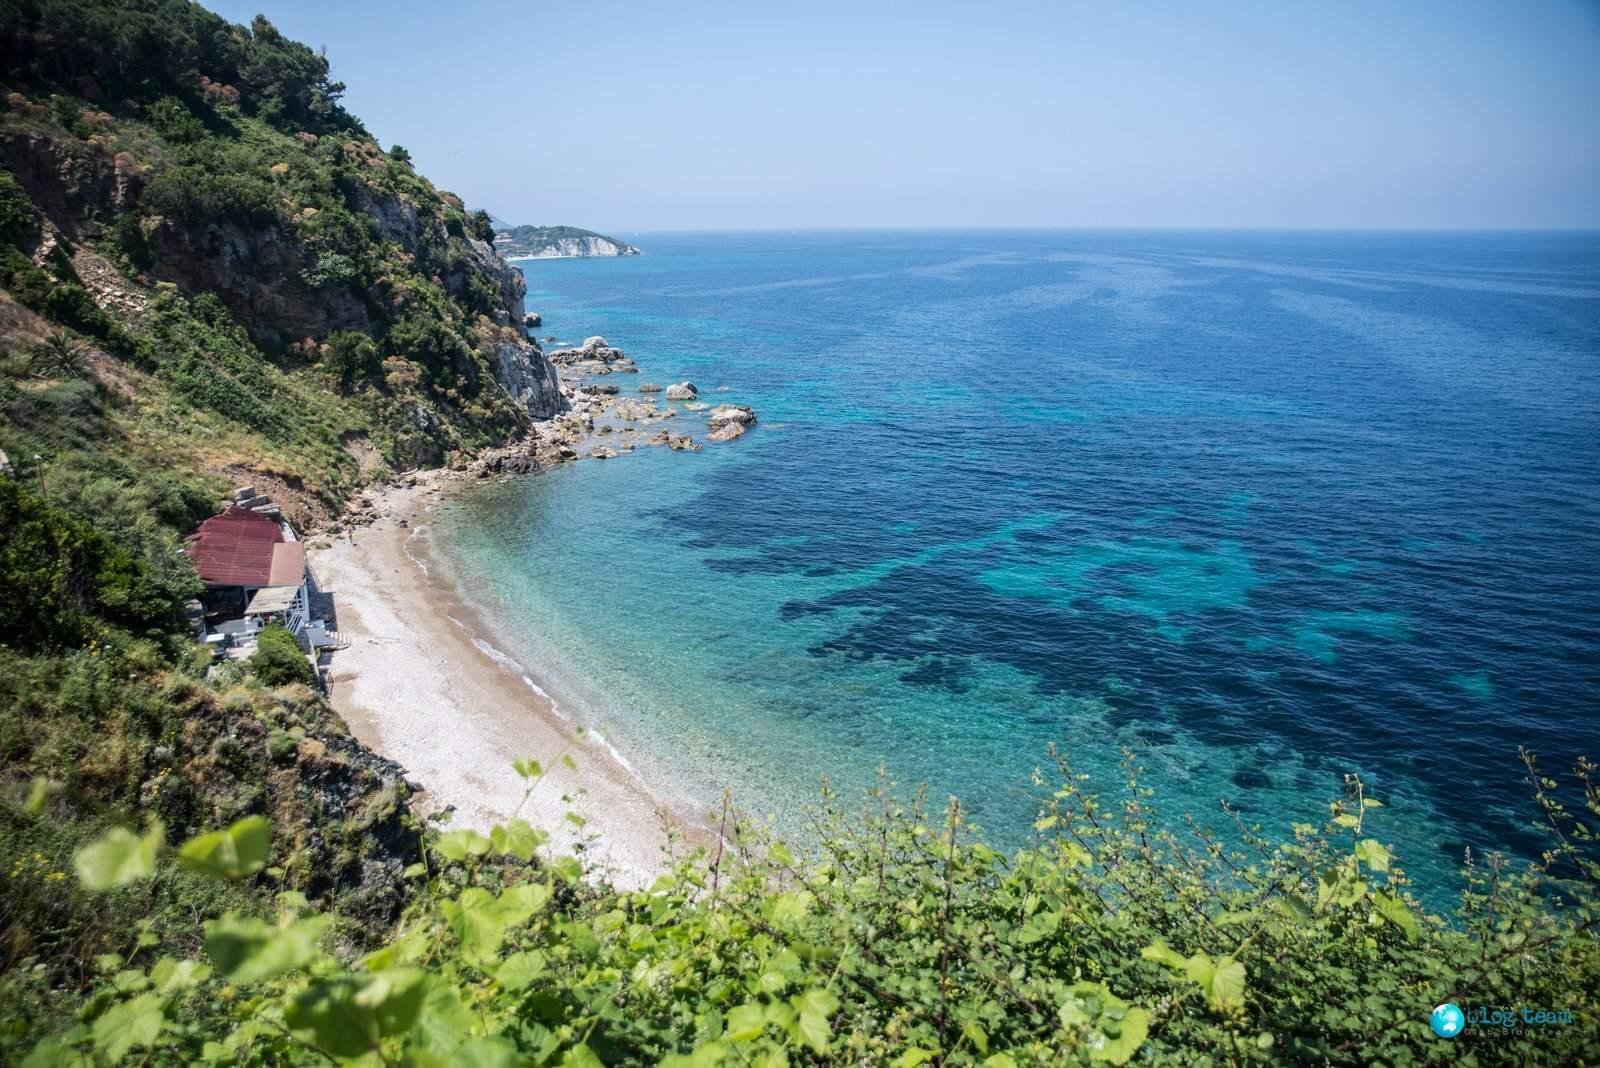 Spiaggia de Le Viste - Elba